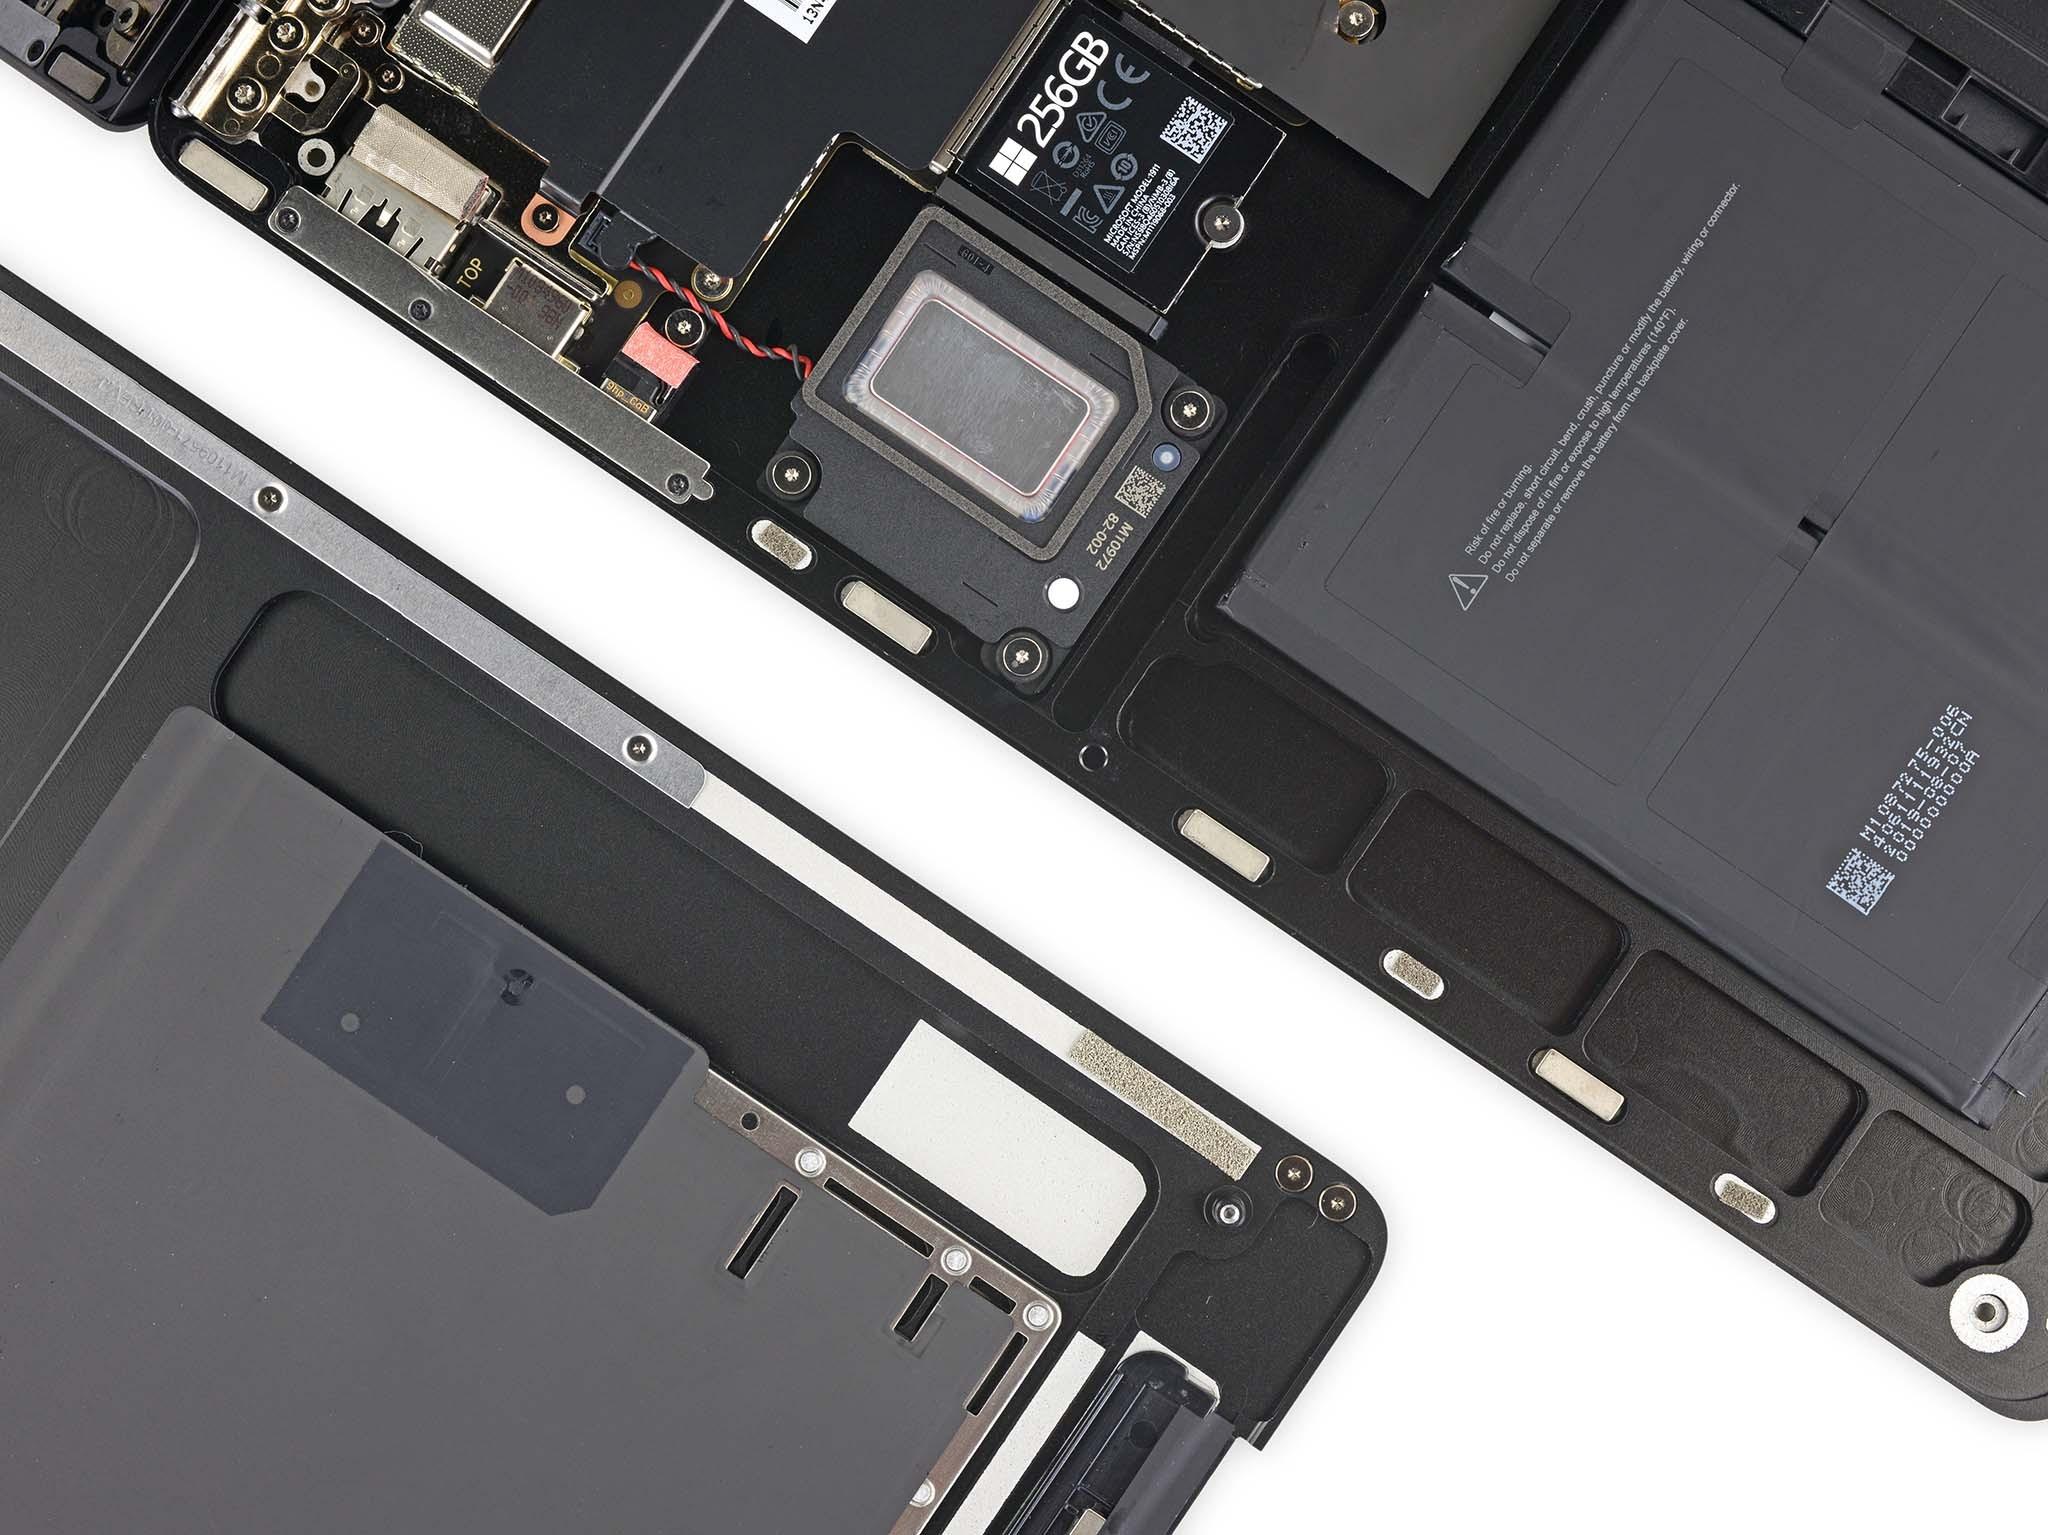 sua-surface-laptop-3-nay-that-de-dang6